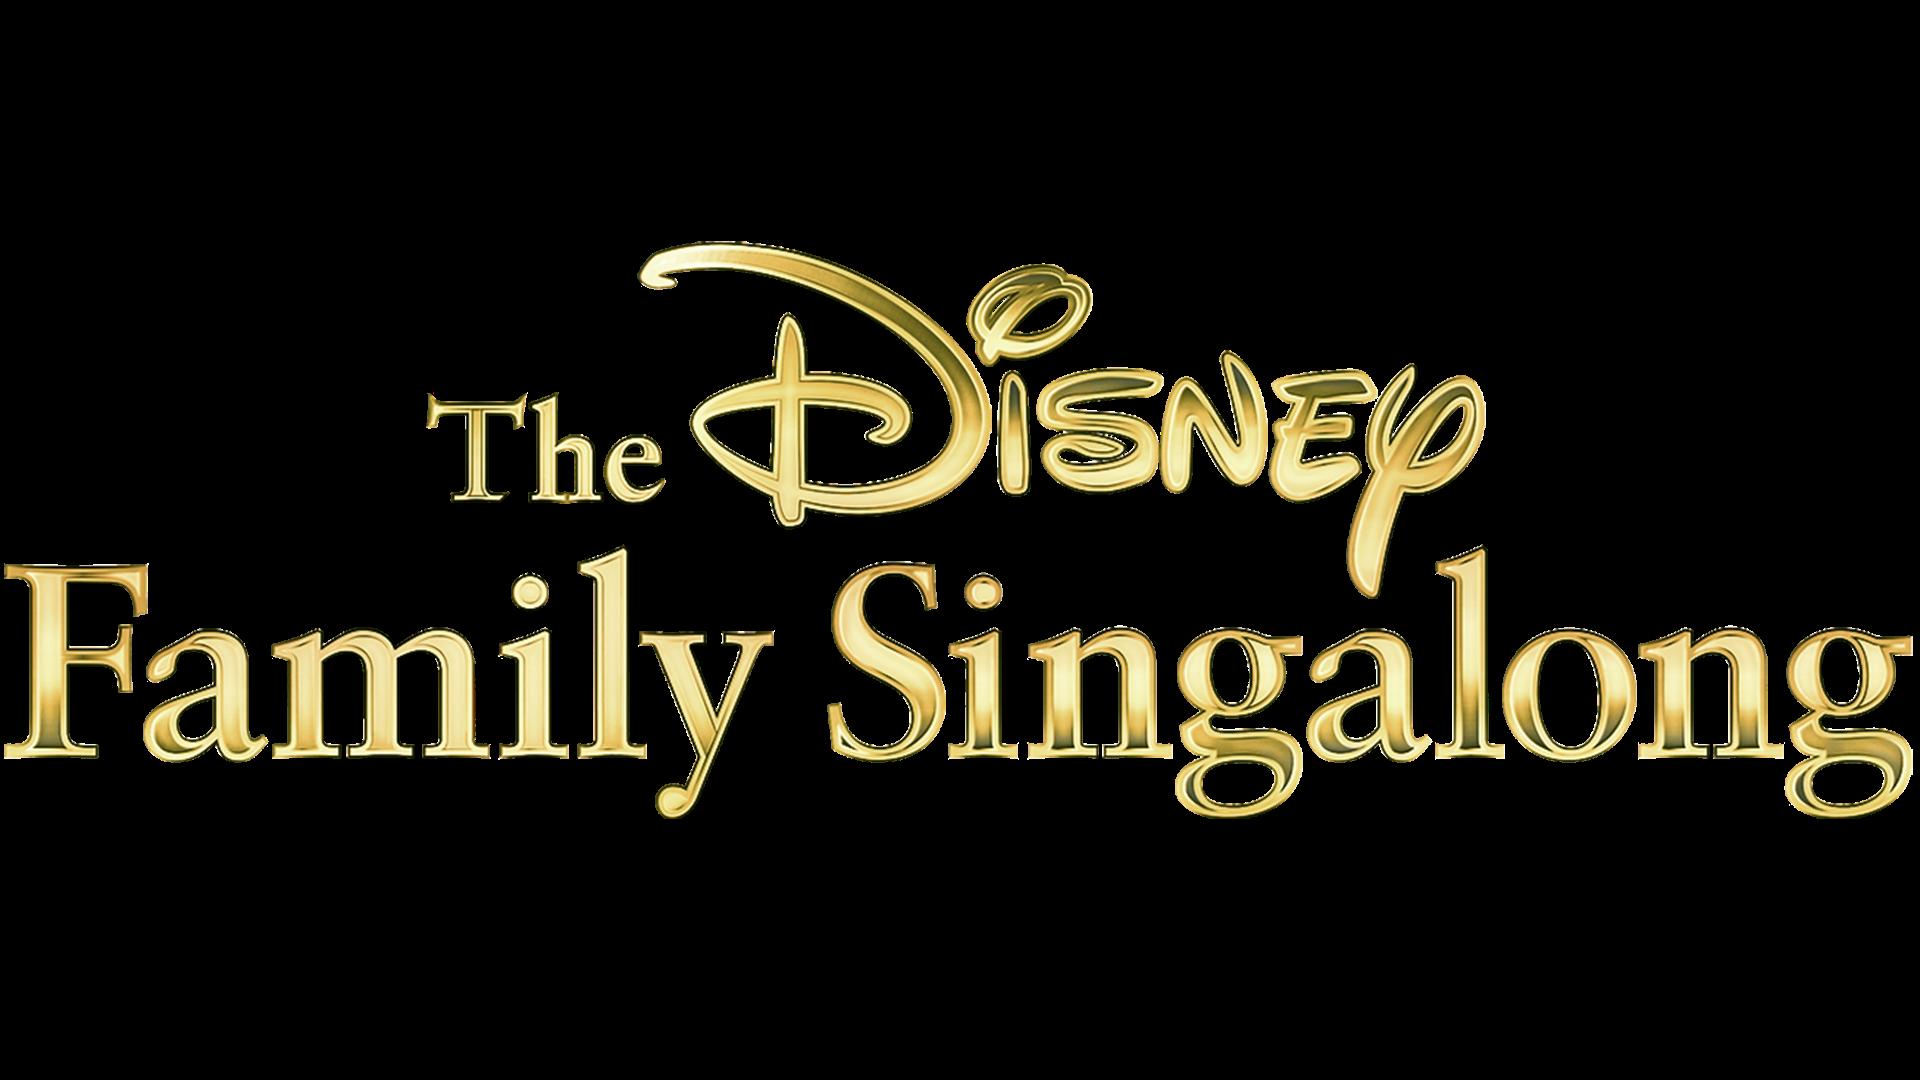 The Disney Family Singalong 2020 • 52 min • Varietà, Famiglia, Musica